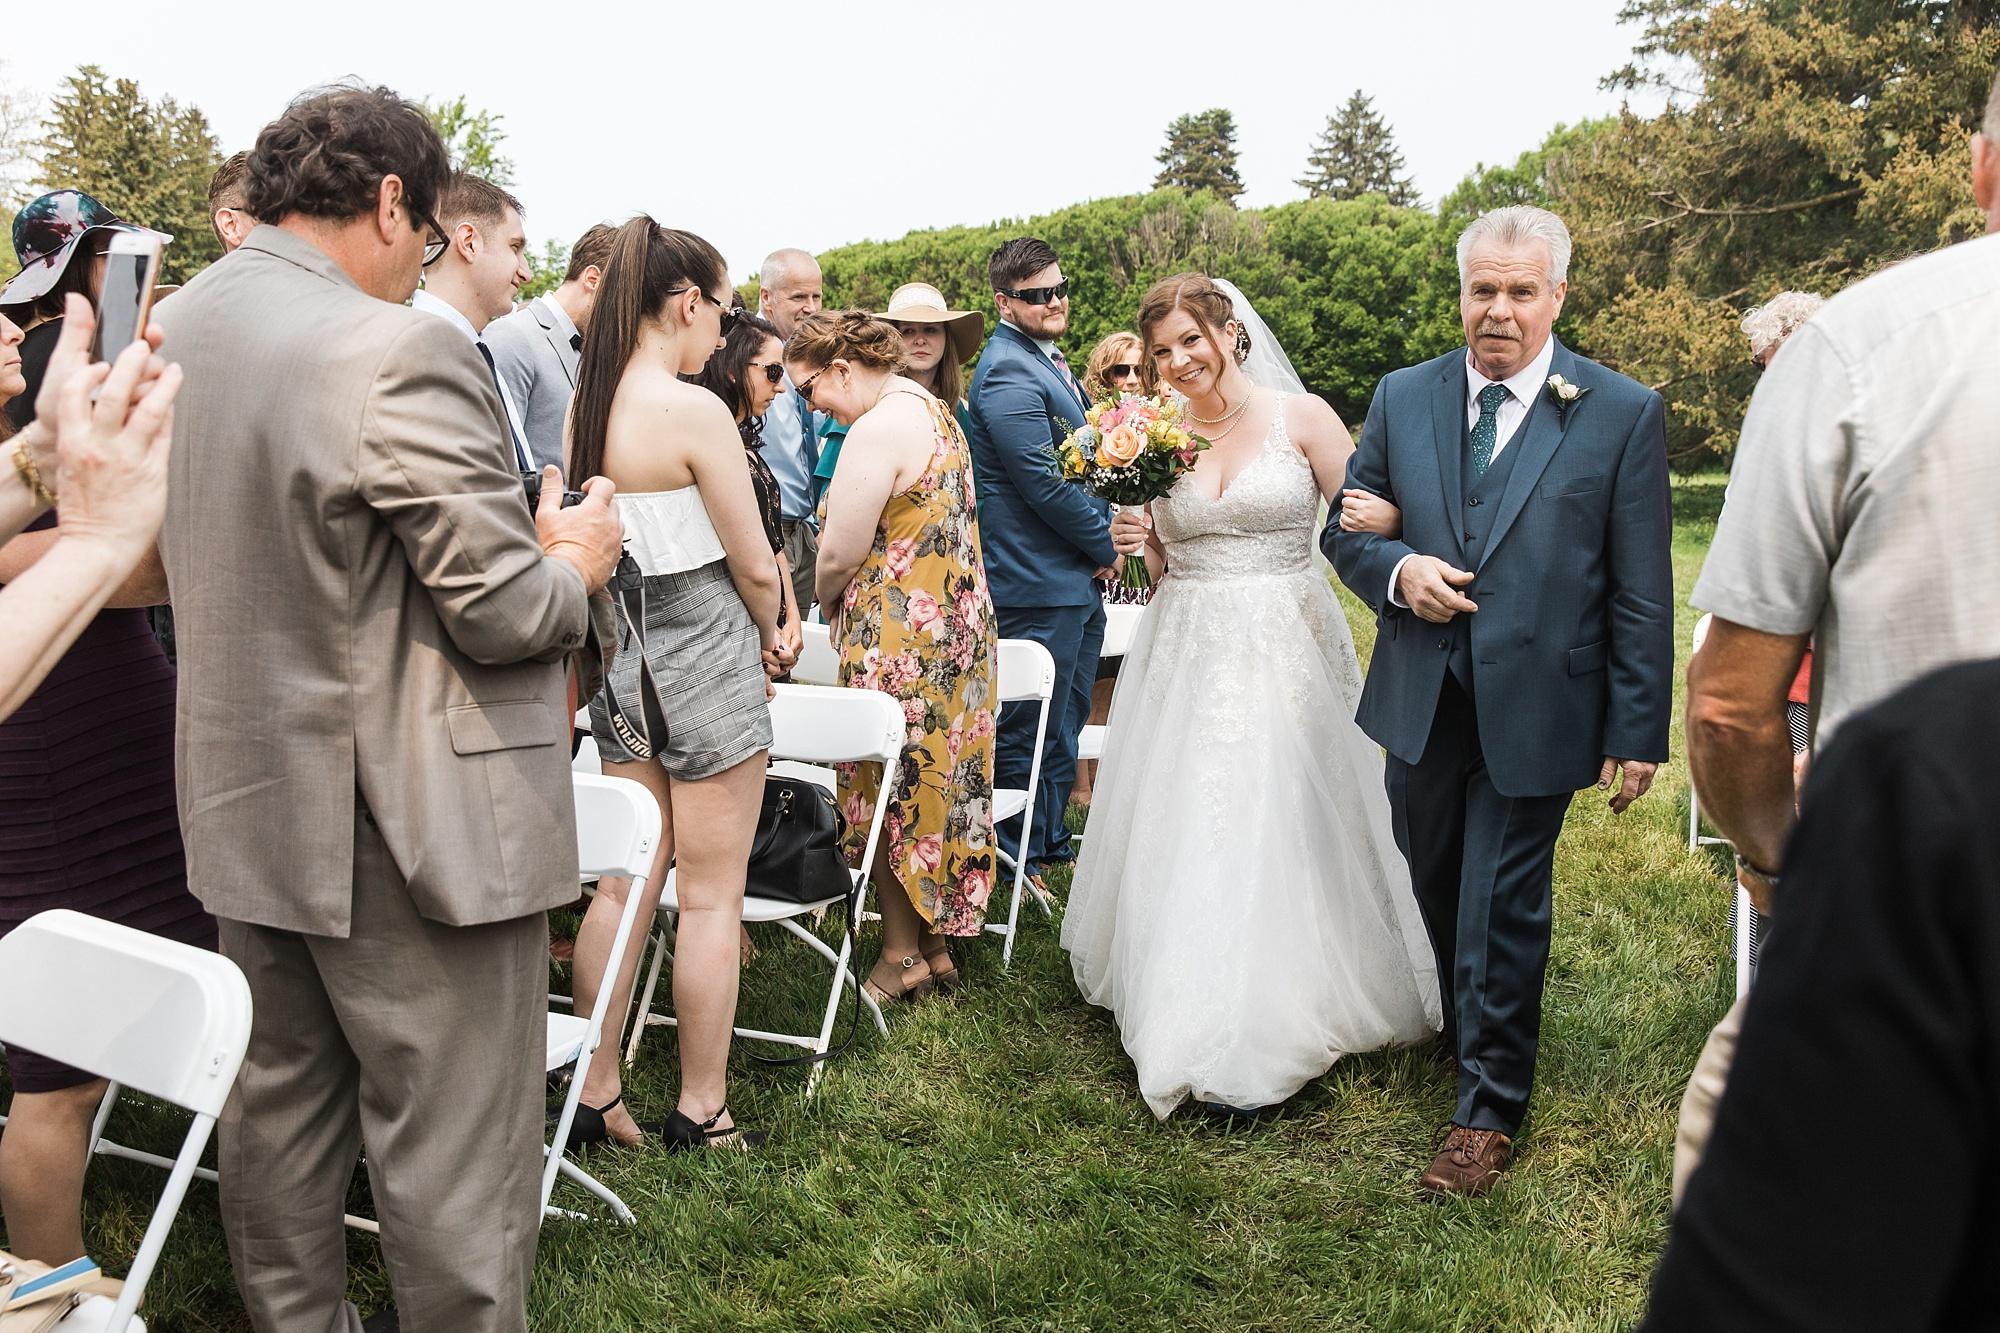 niagarafalls-weddingphotography_0017.jpg